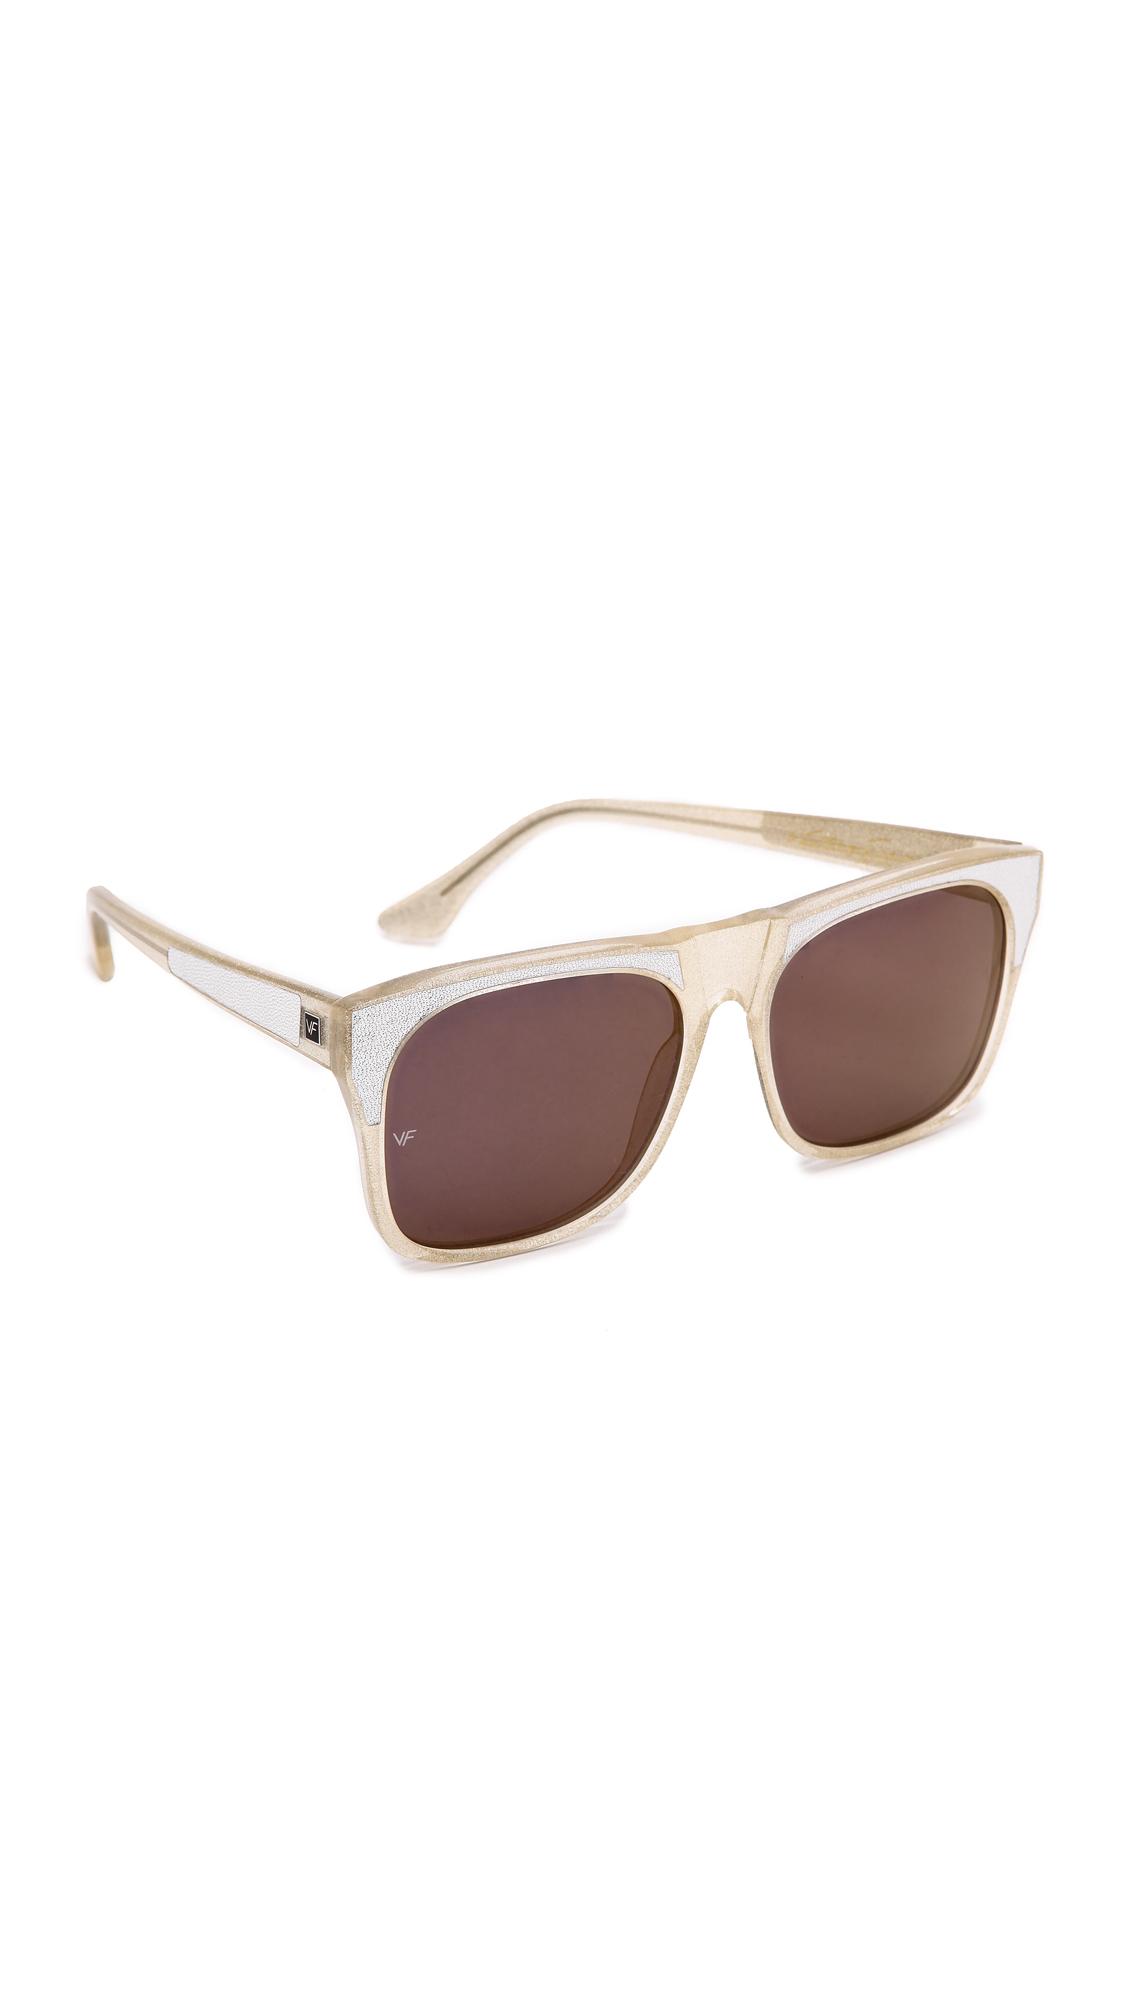 81697ebaf2d0 Lyst - Vintage Frames Company Rude Sunglasses - Silver/Gold in Metallic